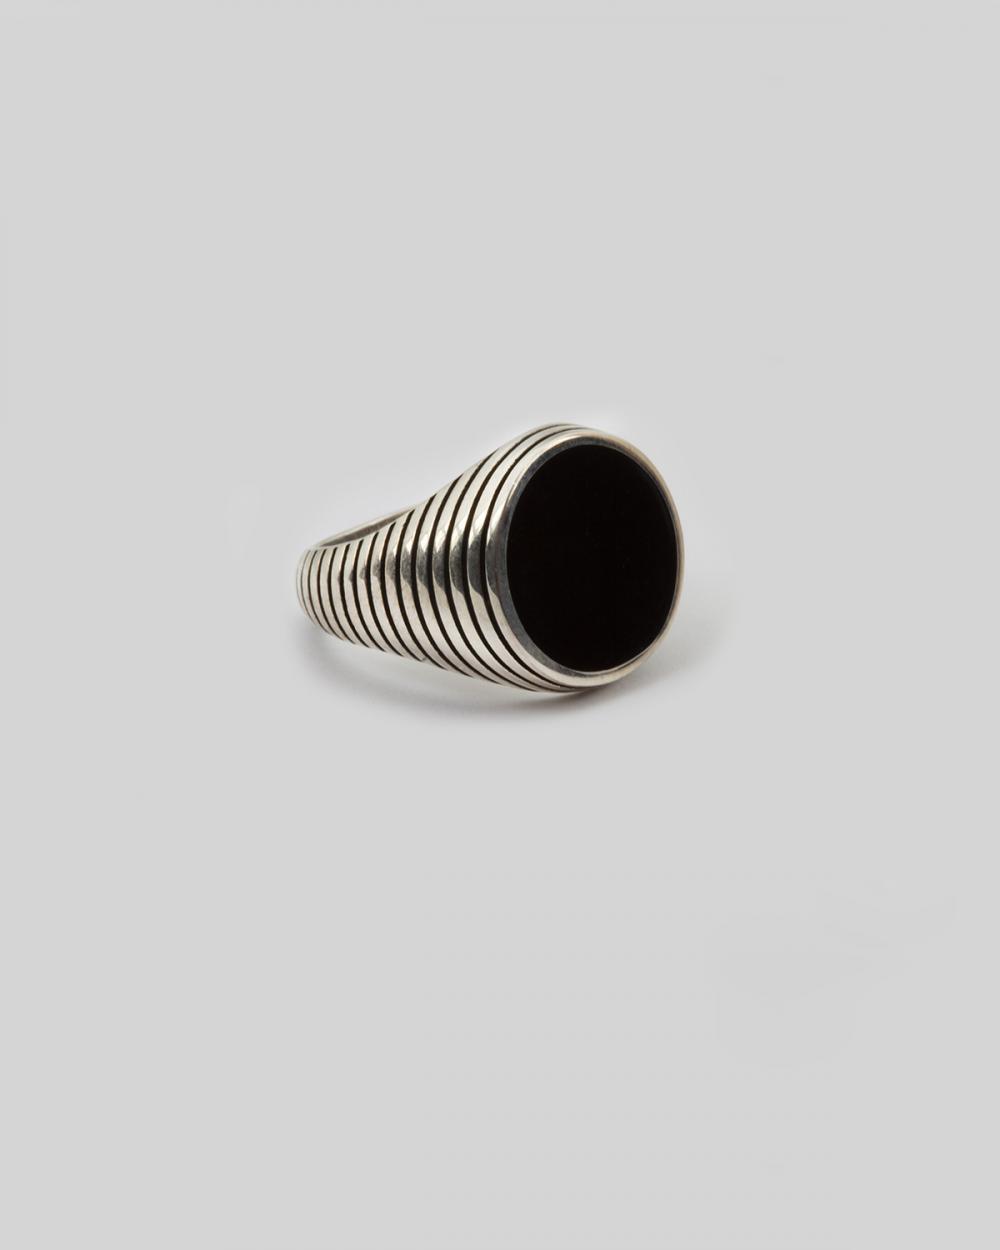 Archive Sale BLACK ENAMELLED ROUND STRIPED SIGNET RING NOVE25